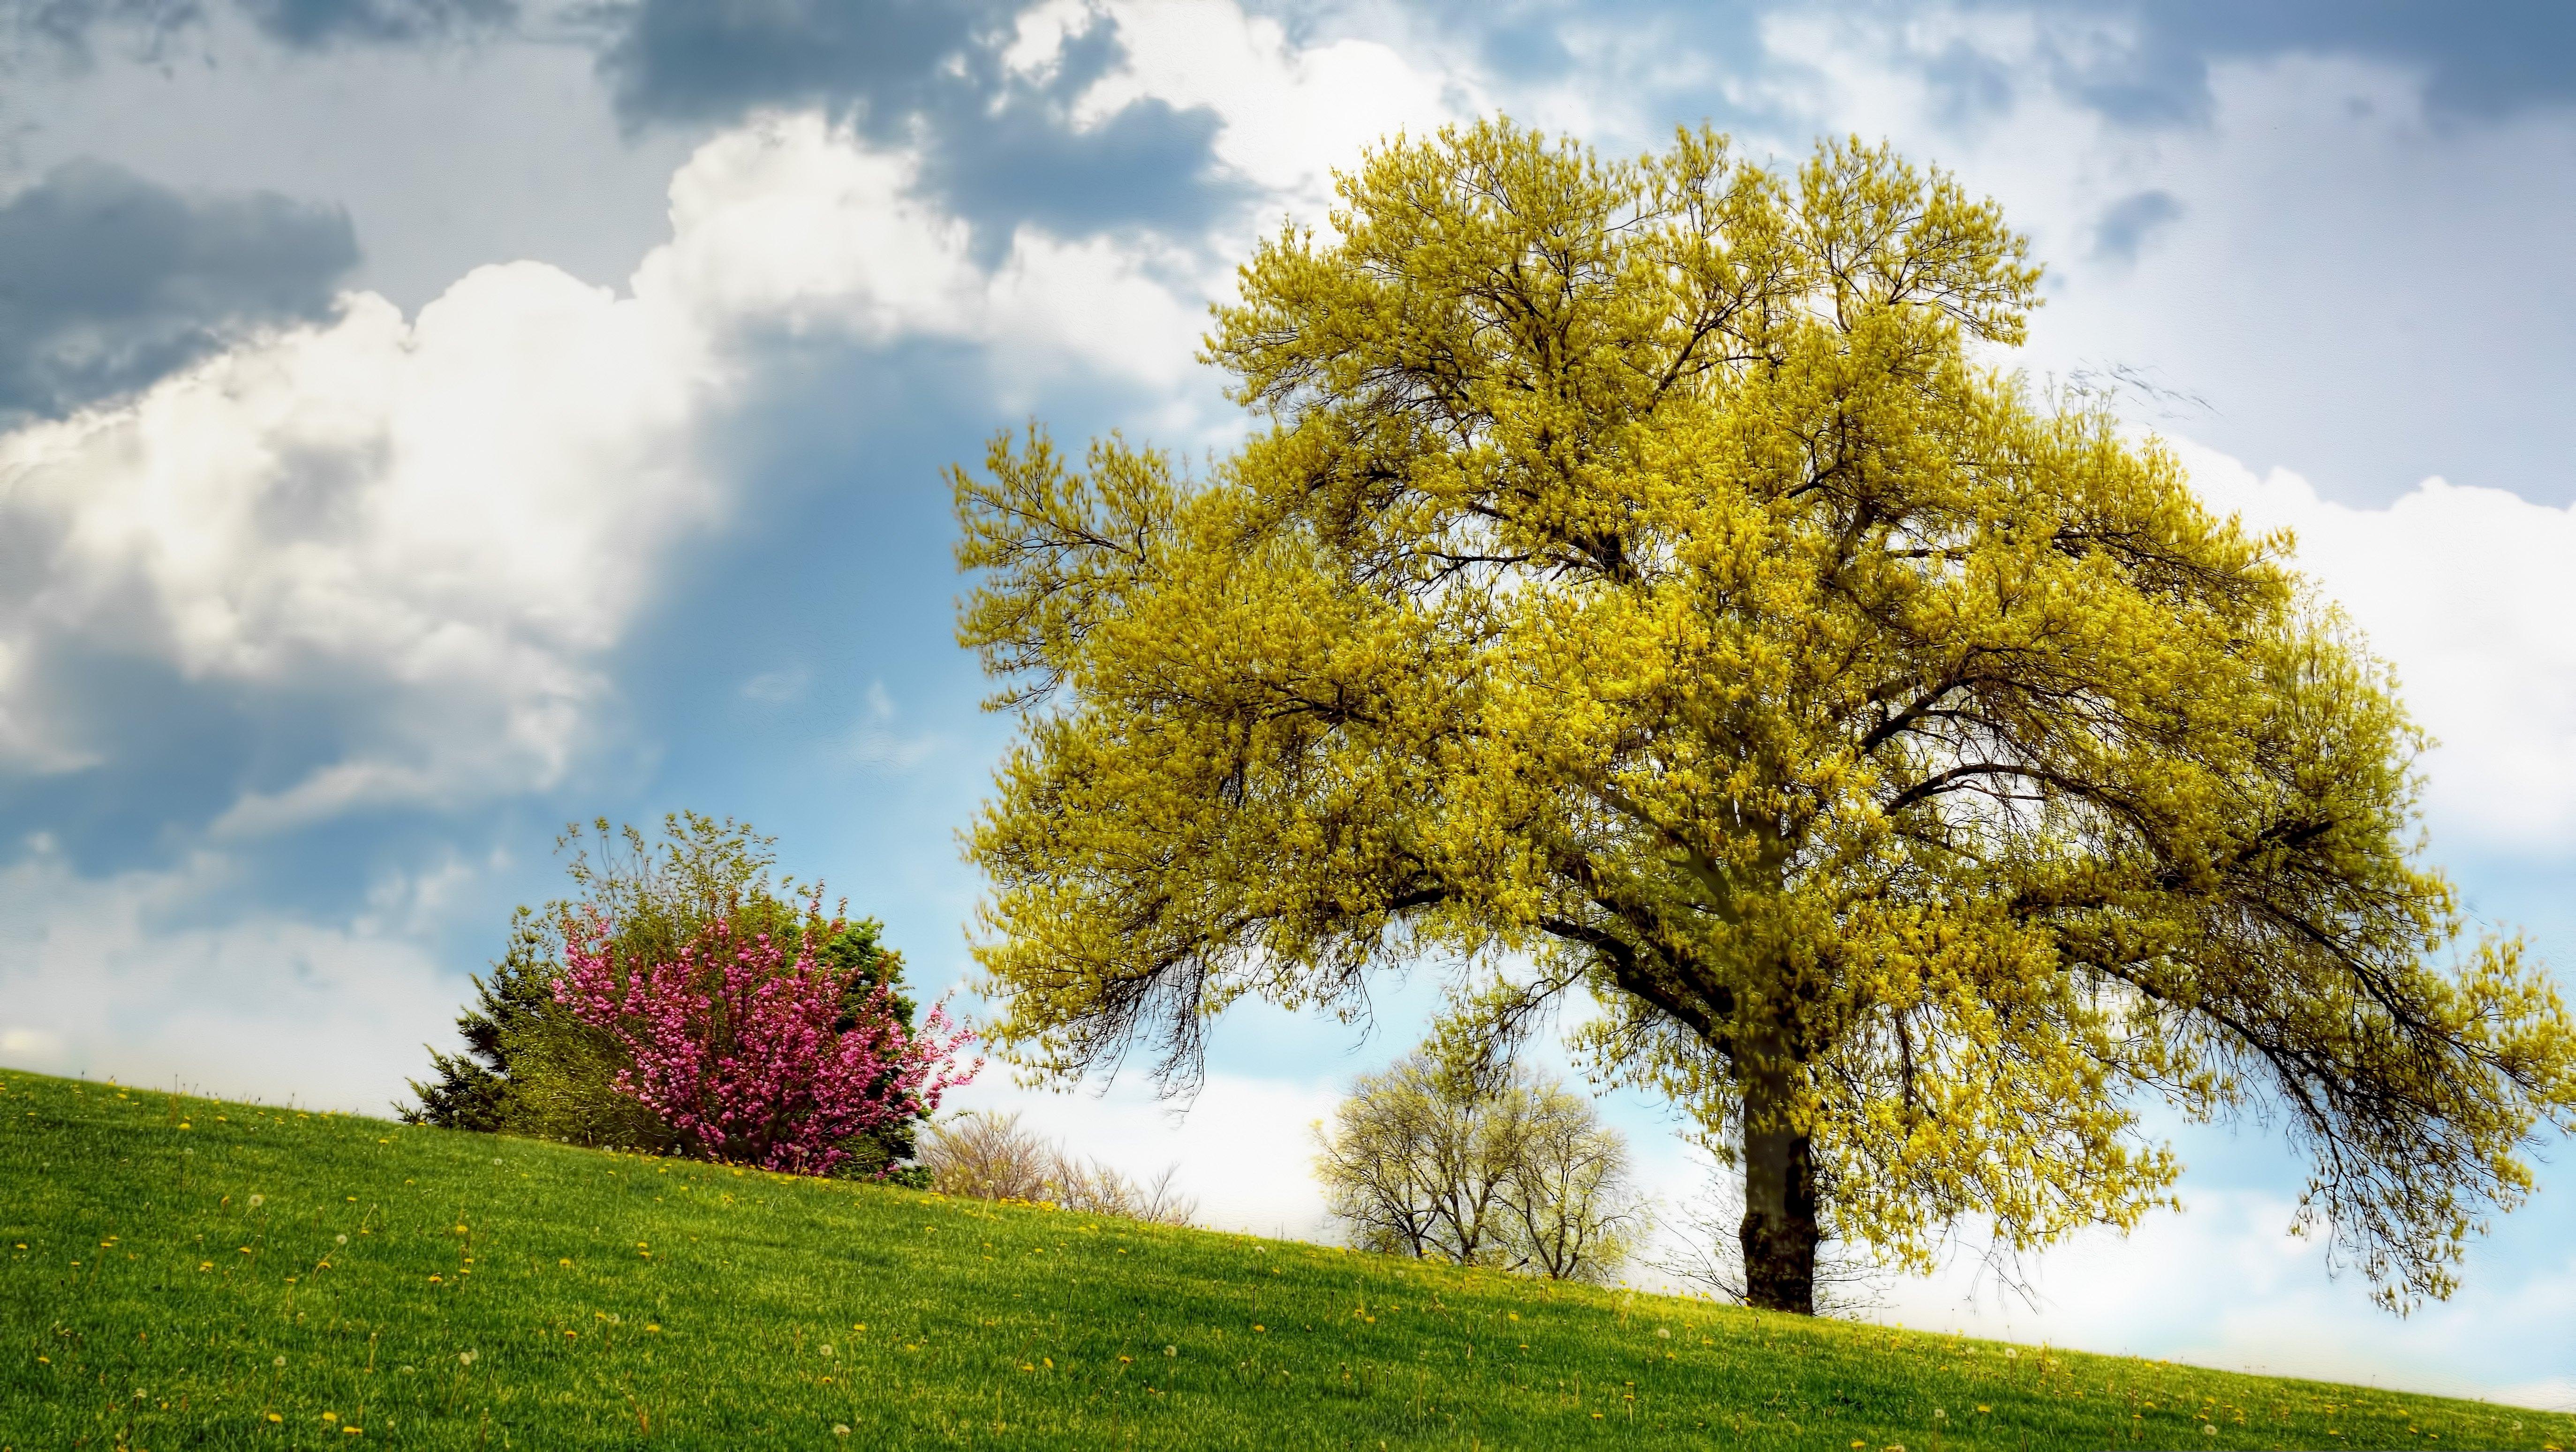 картинки фото деревья кустарники можно тоже